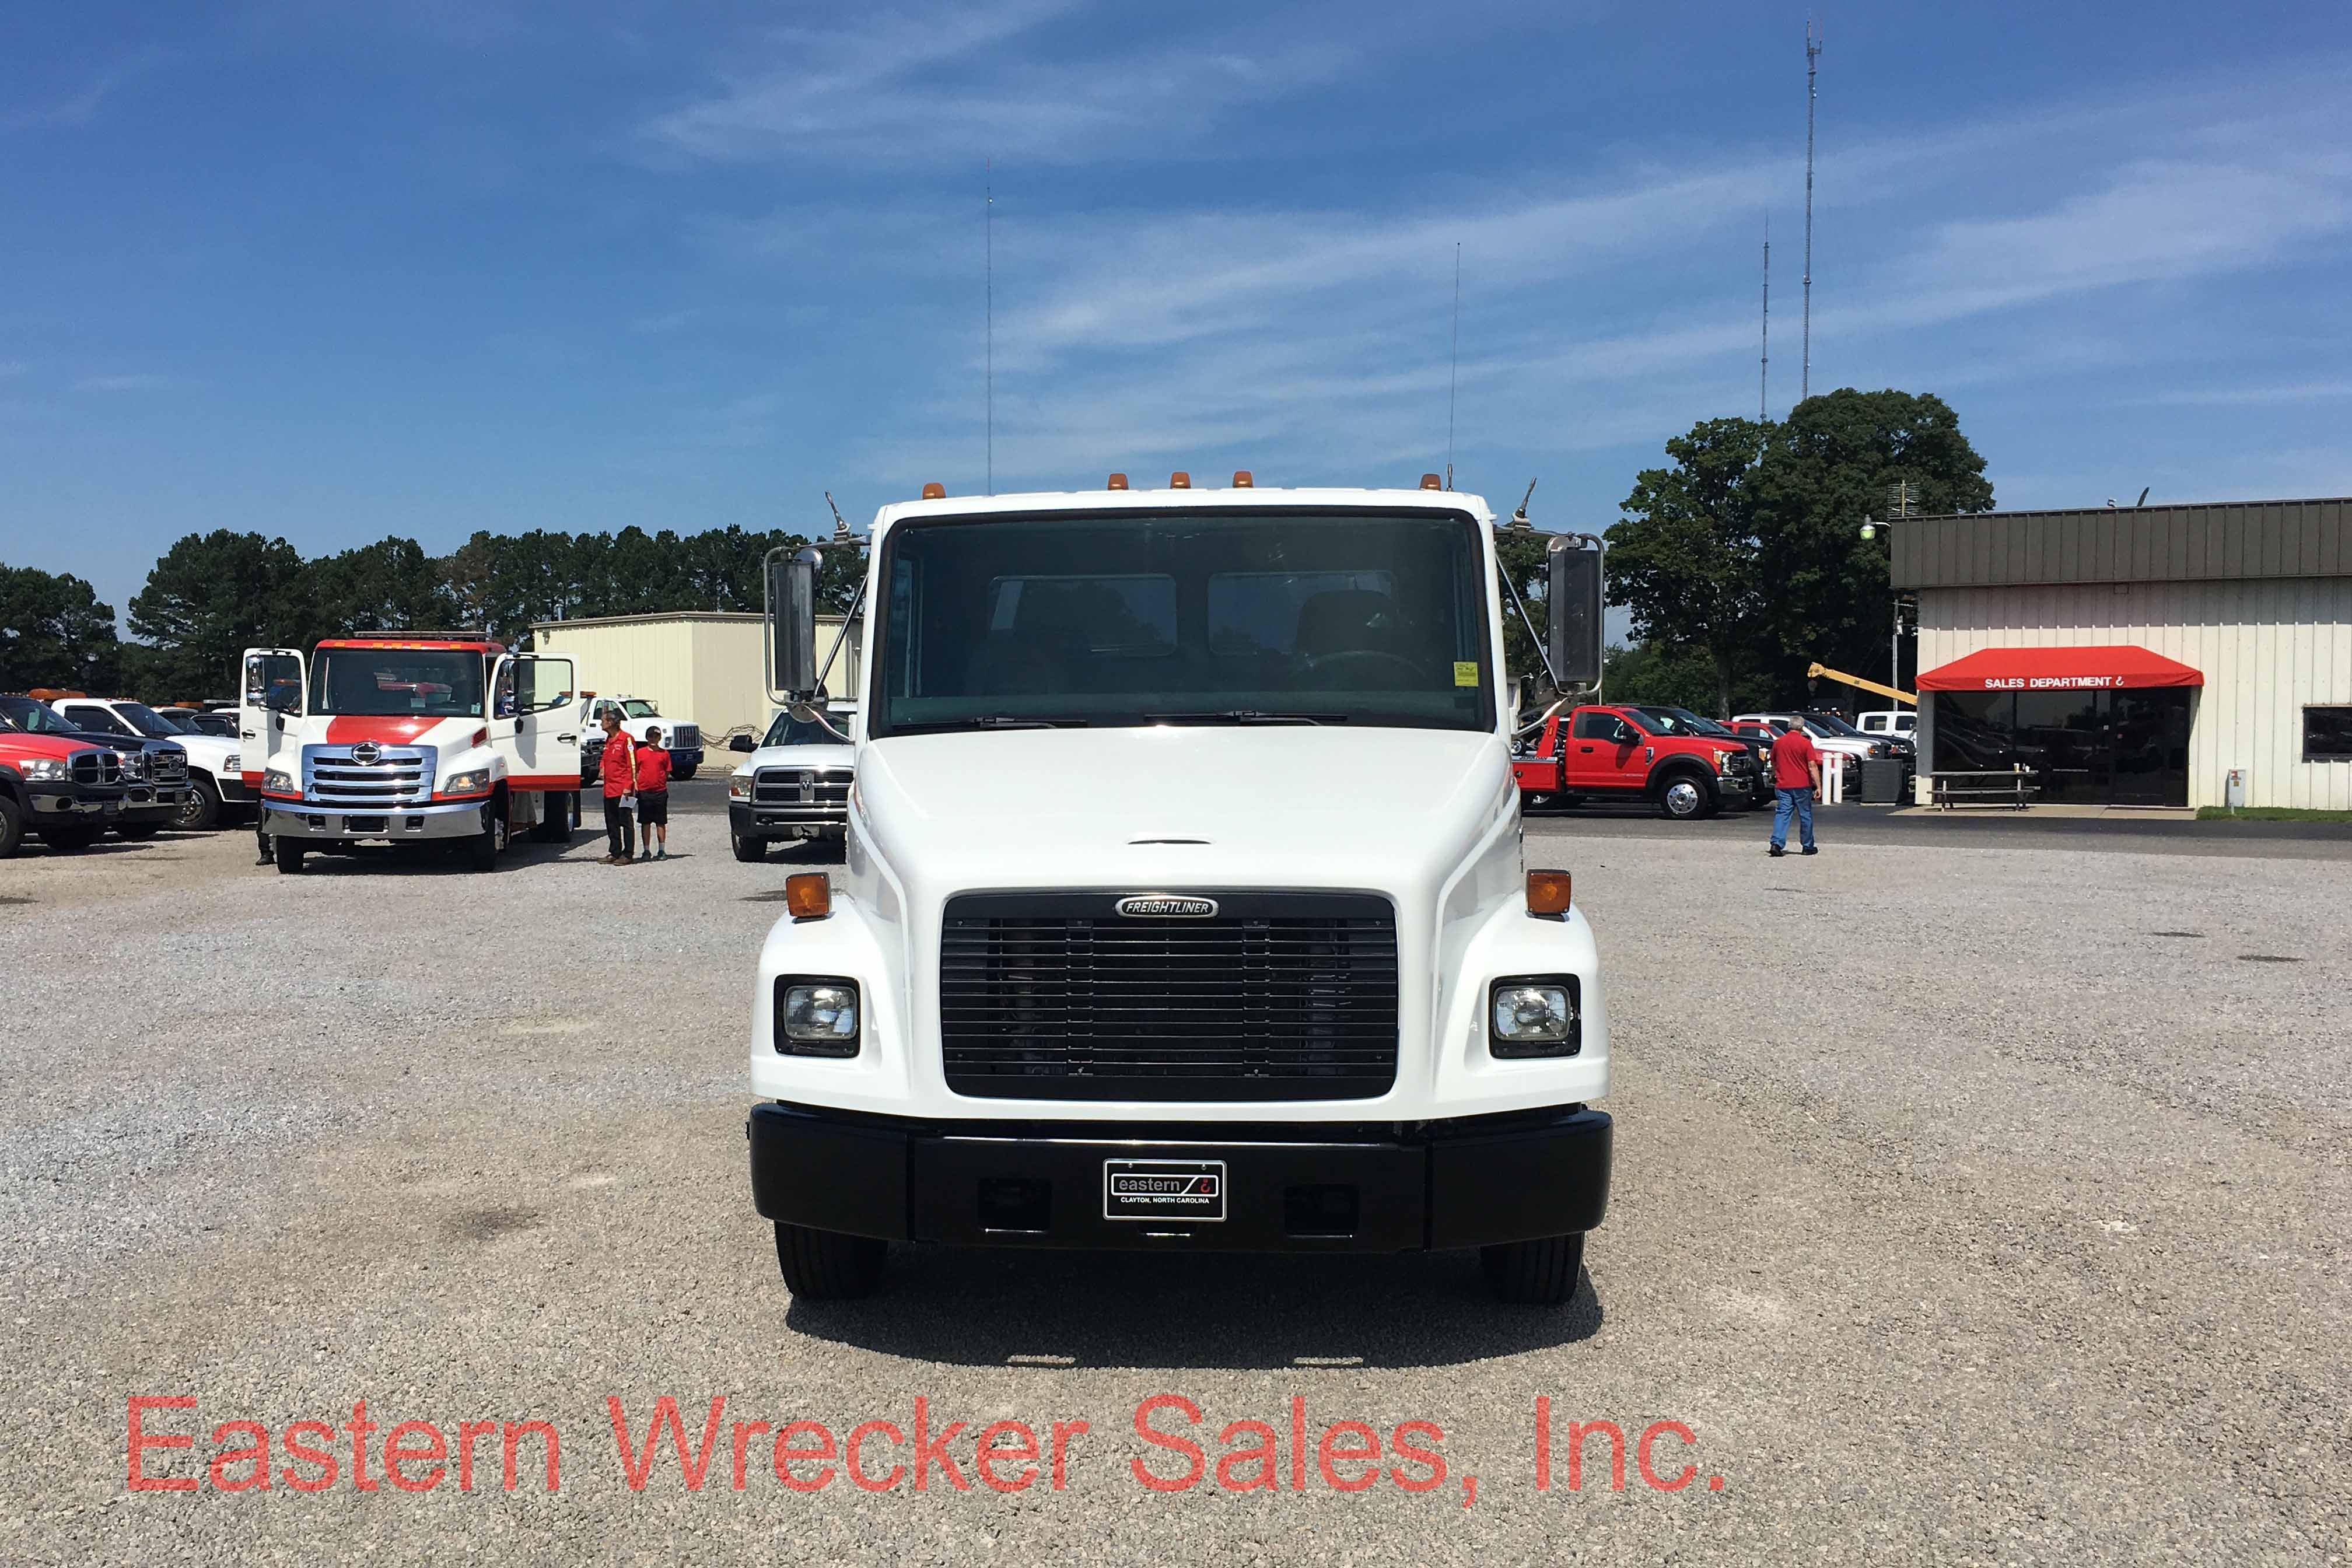 2000 freightliner century wrecker tow truck for sale